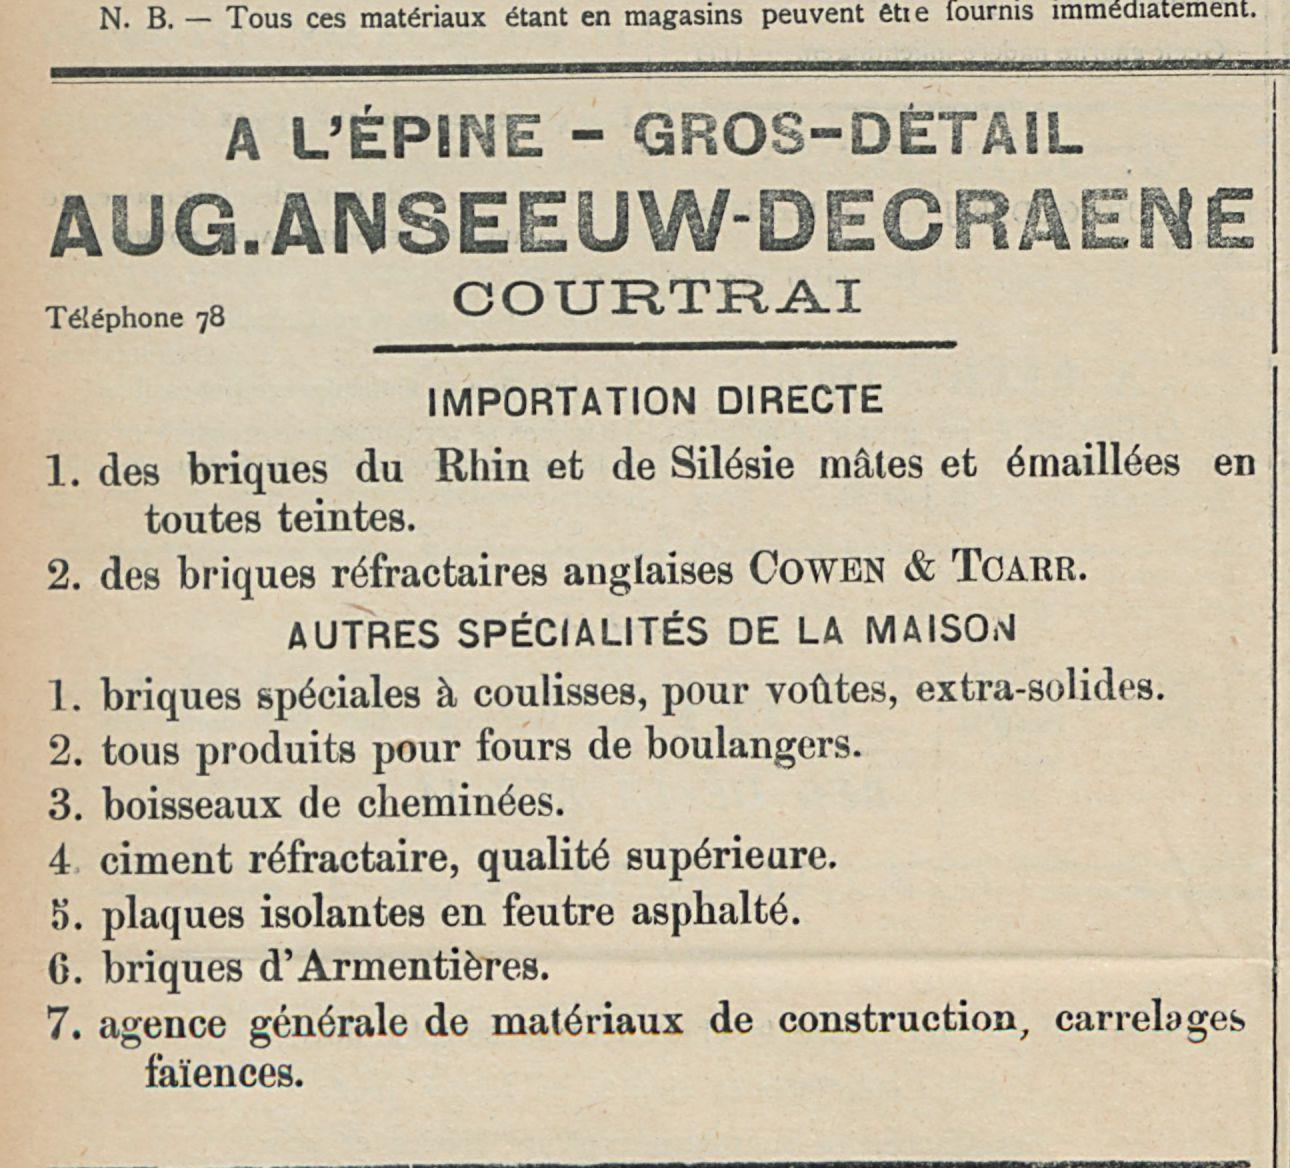 AUG.ANSEEUW-DECRAENE